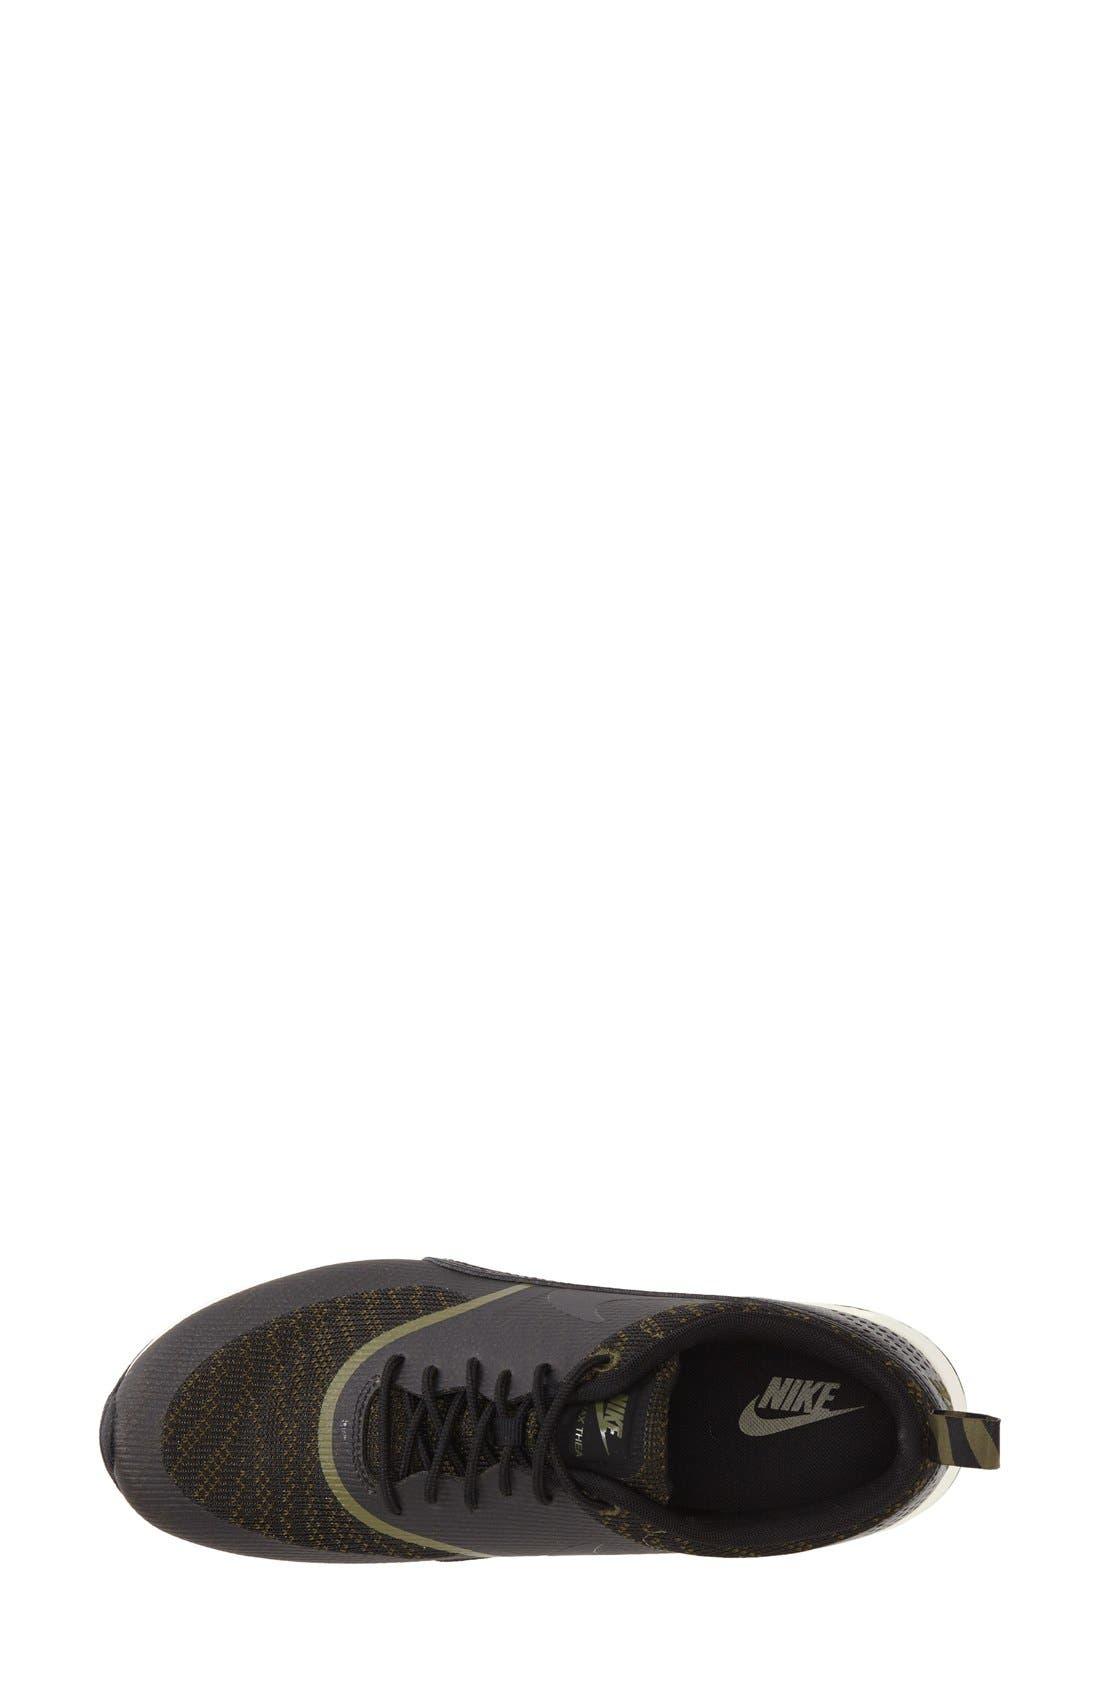 Alternate Image 3  - Nike 'Air Max Thea Jacquard' Sneaker (Women)